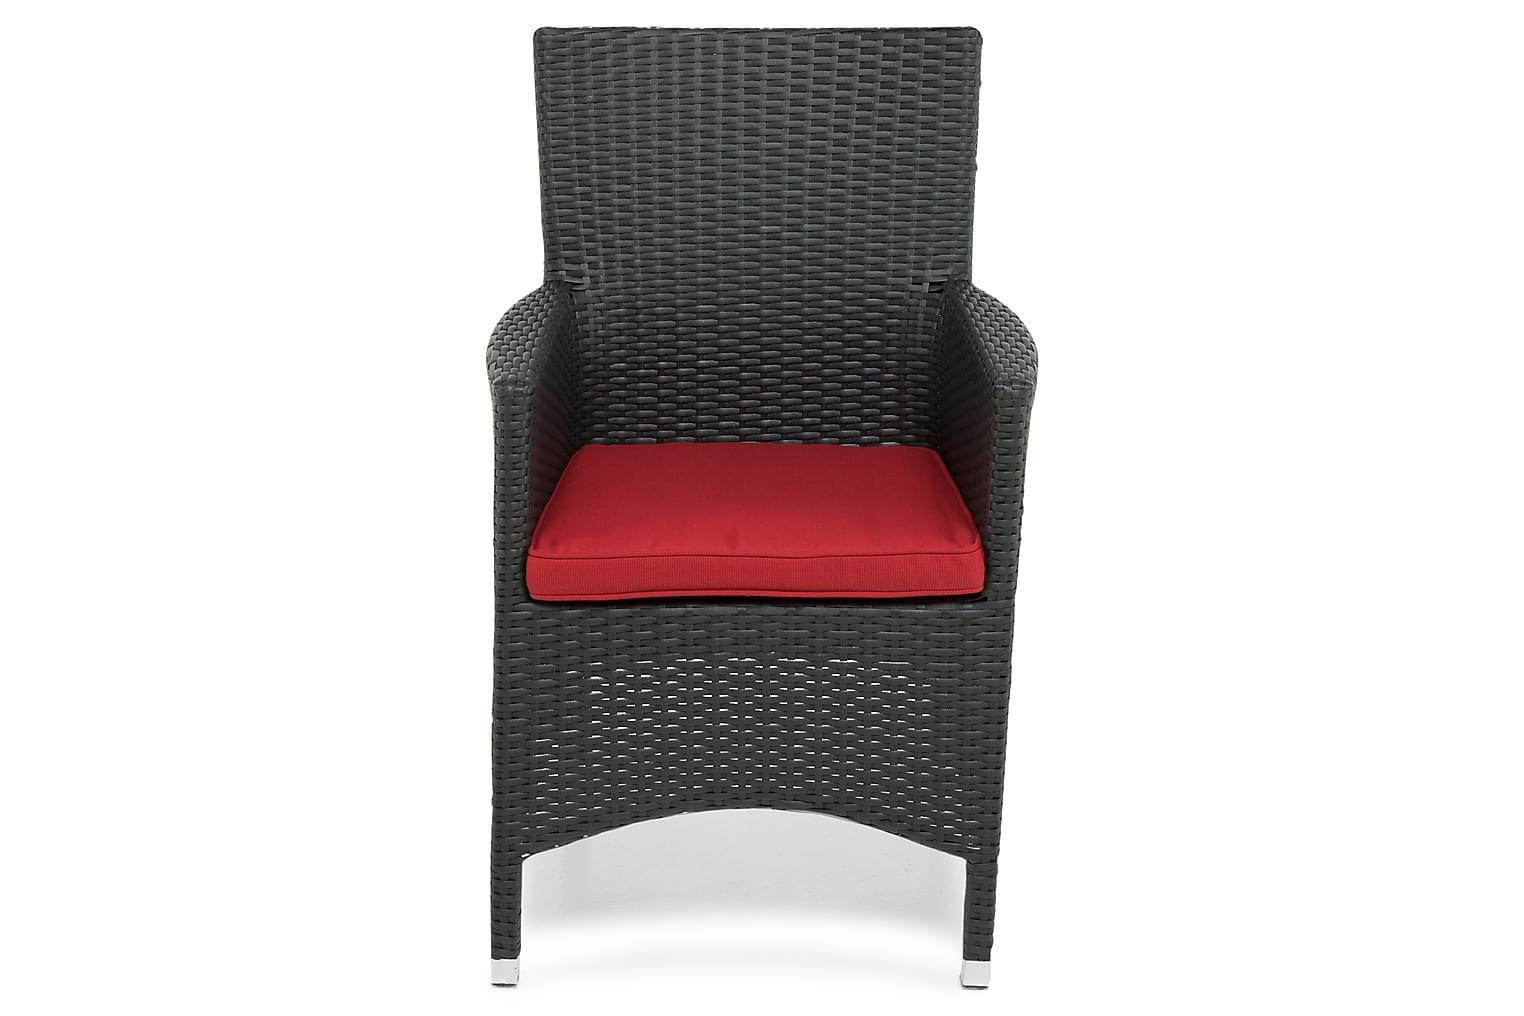 PAIGE Istuinpehmuste Punainen